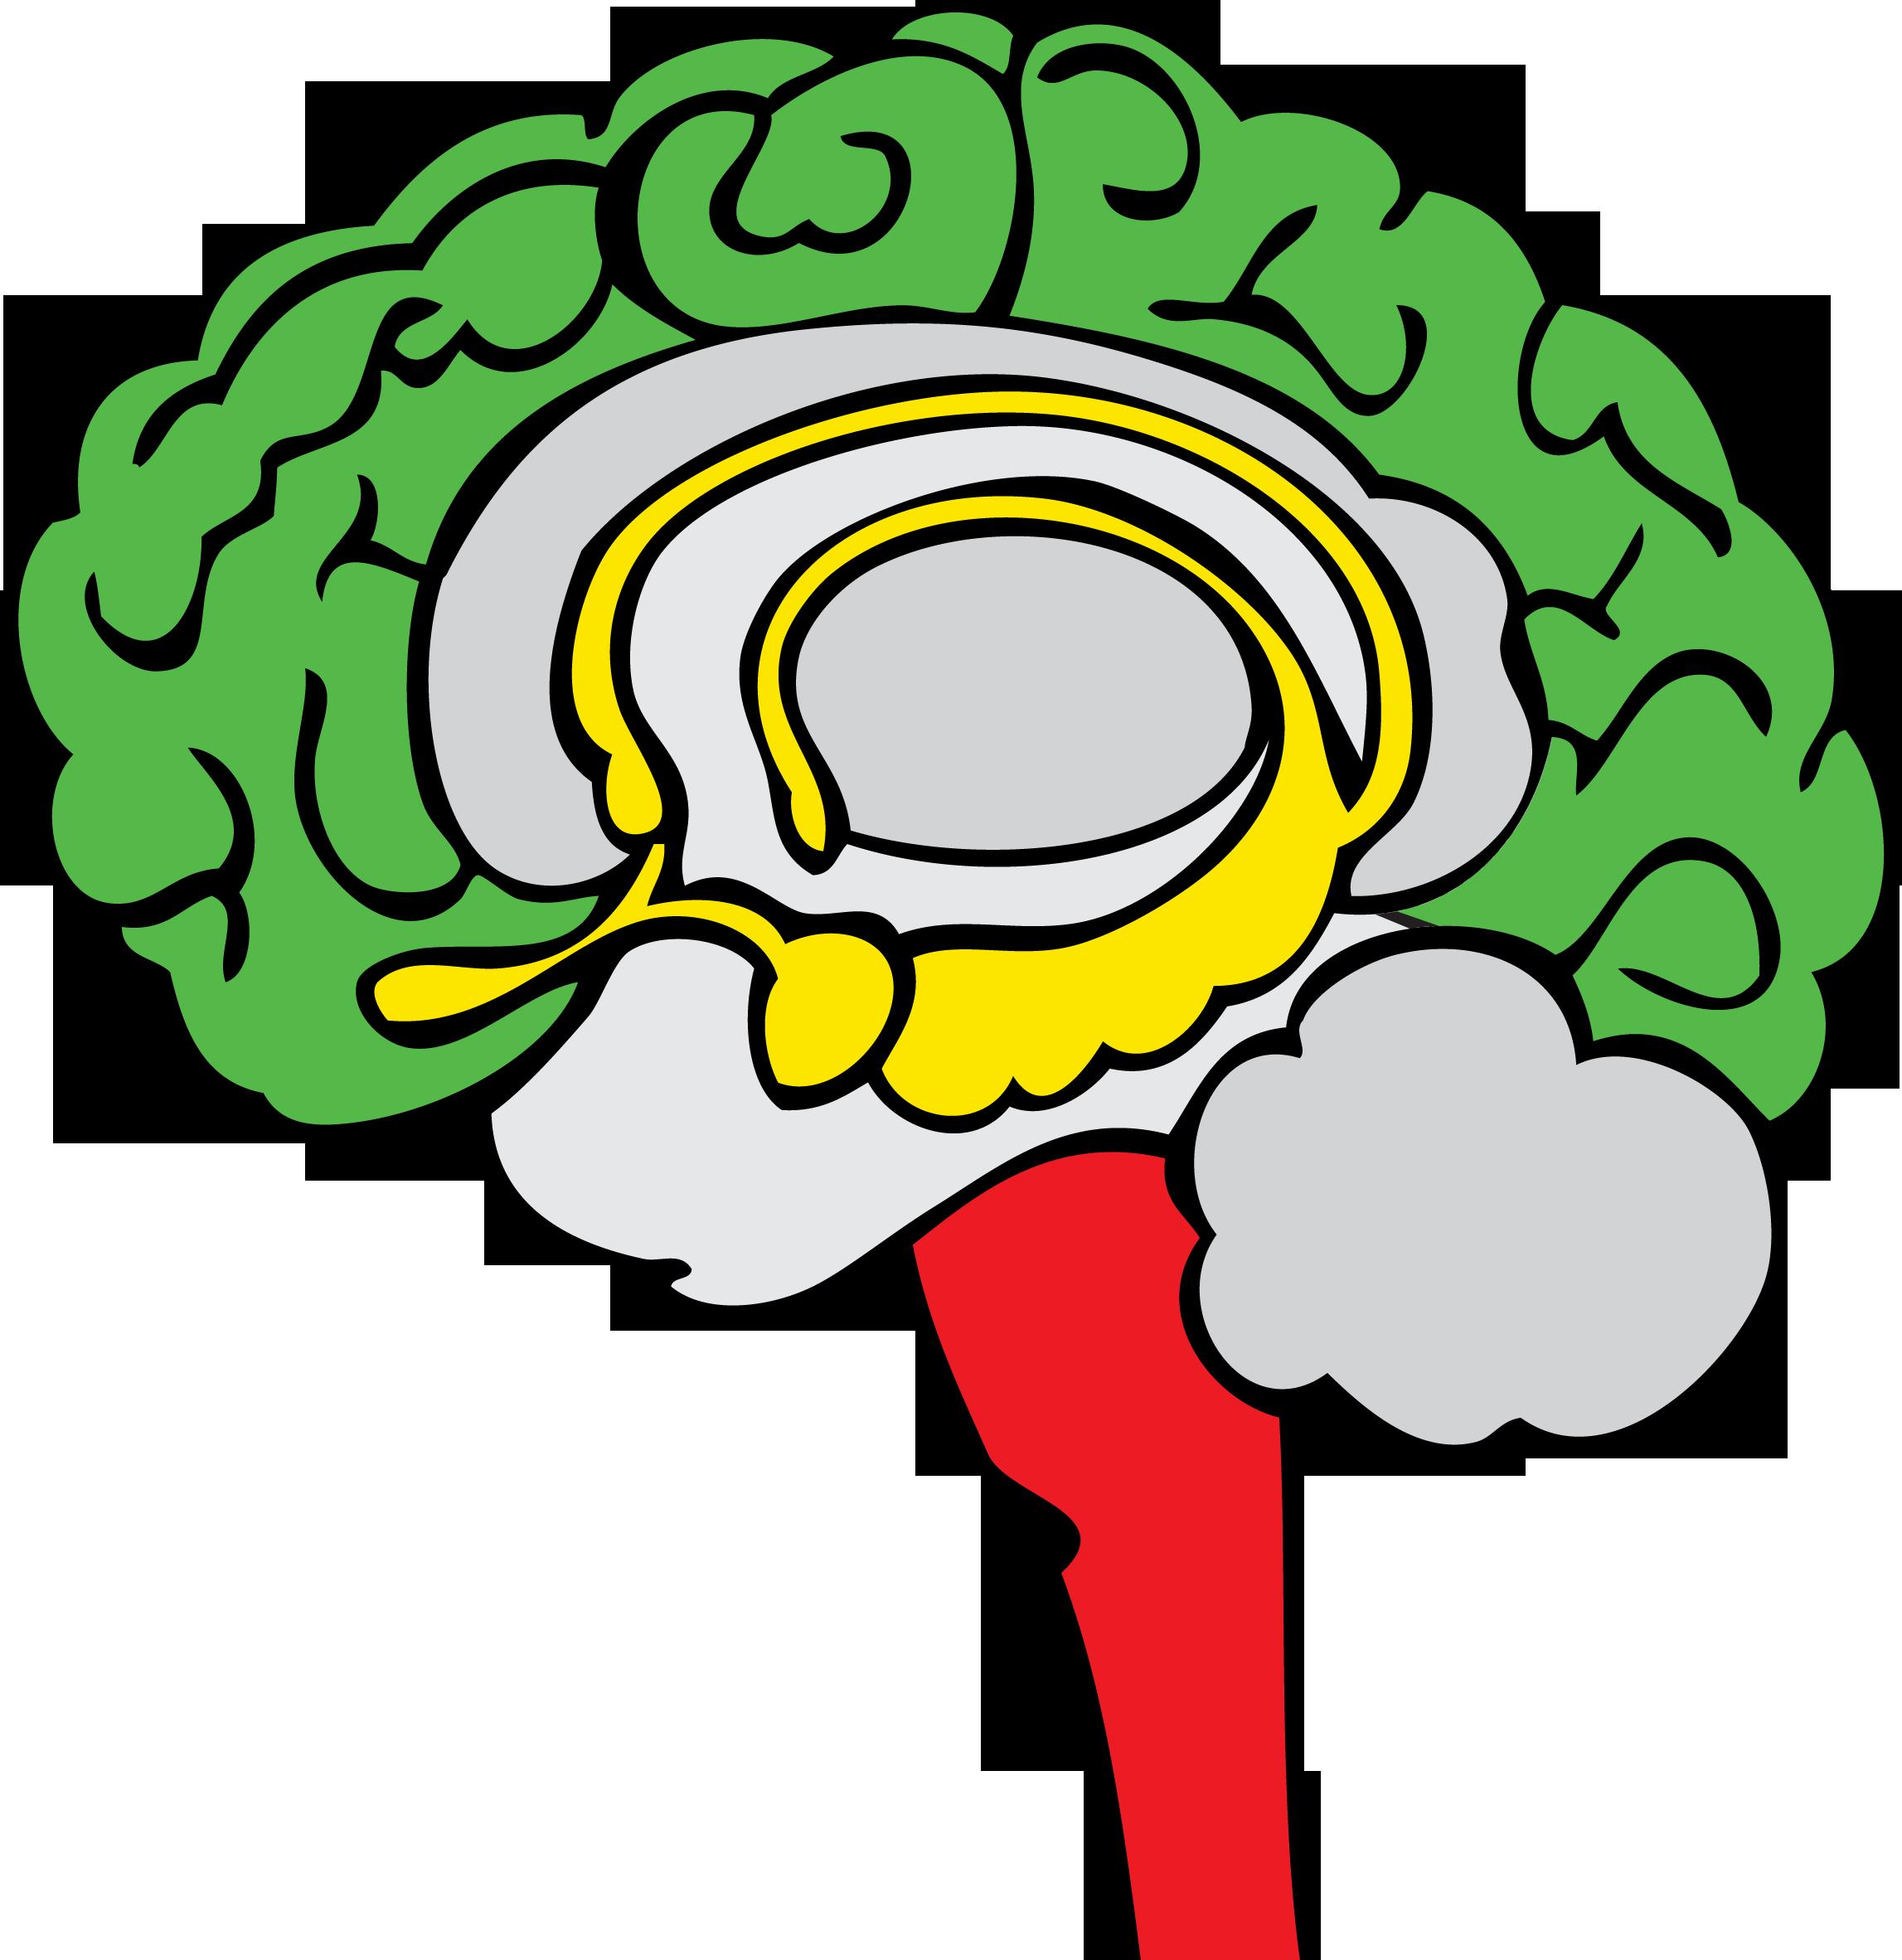 The three basic regions of the brain: the Neocortex  (Green Brain) , the Limbic System  (Yellow Brain) , and the Brain Stem  (Red Brain) .